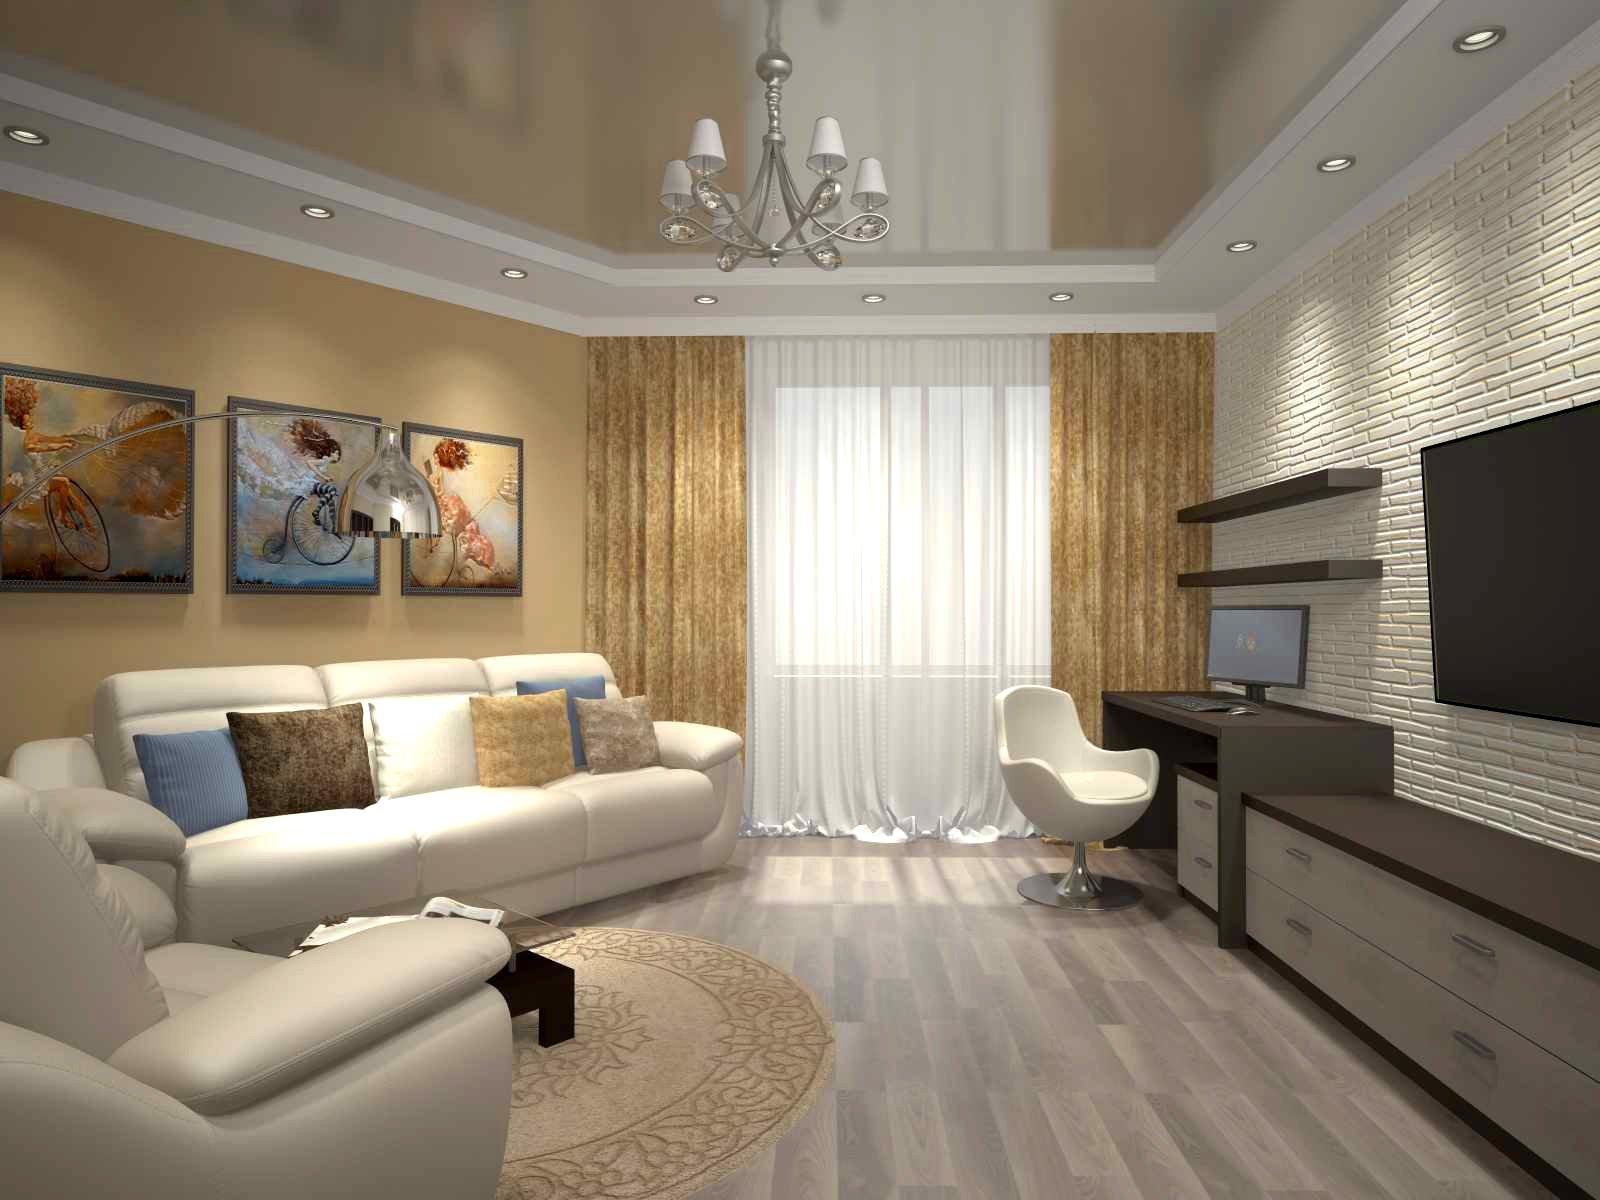 Дизайн интерьера 1комнатной квартиры 37 кв метров